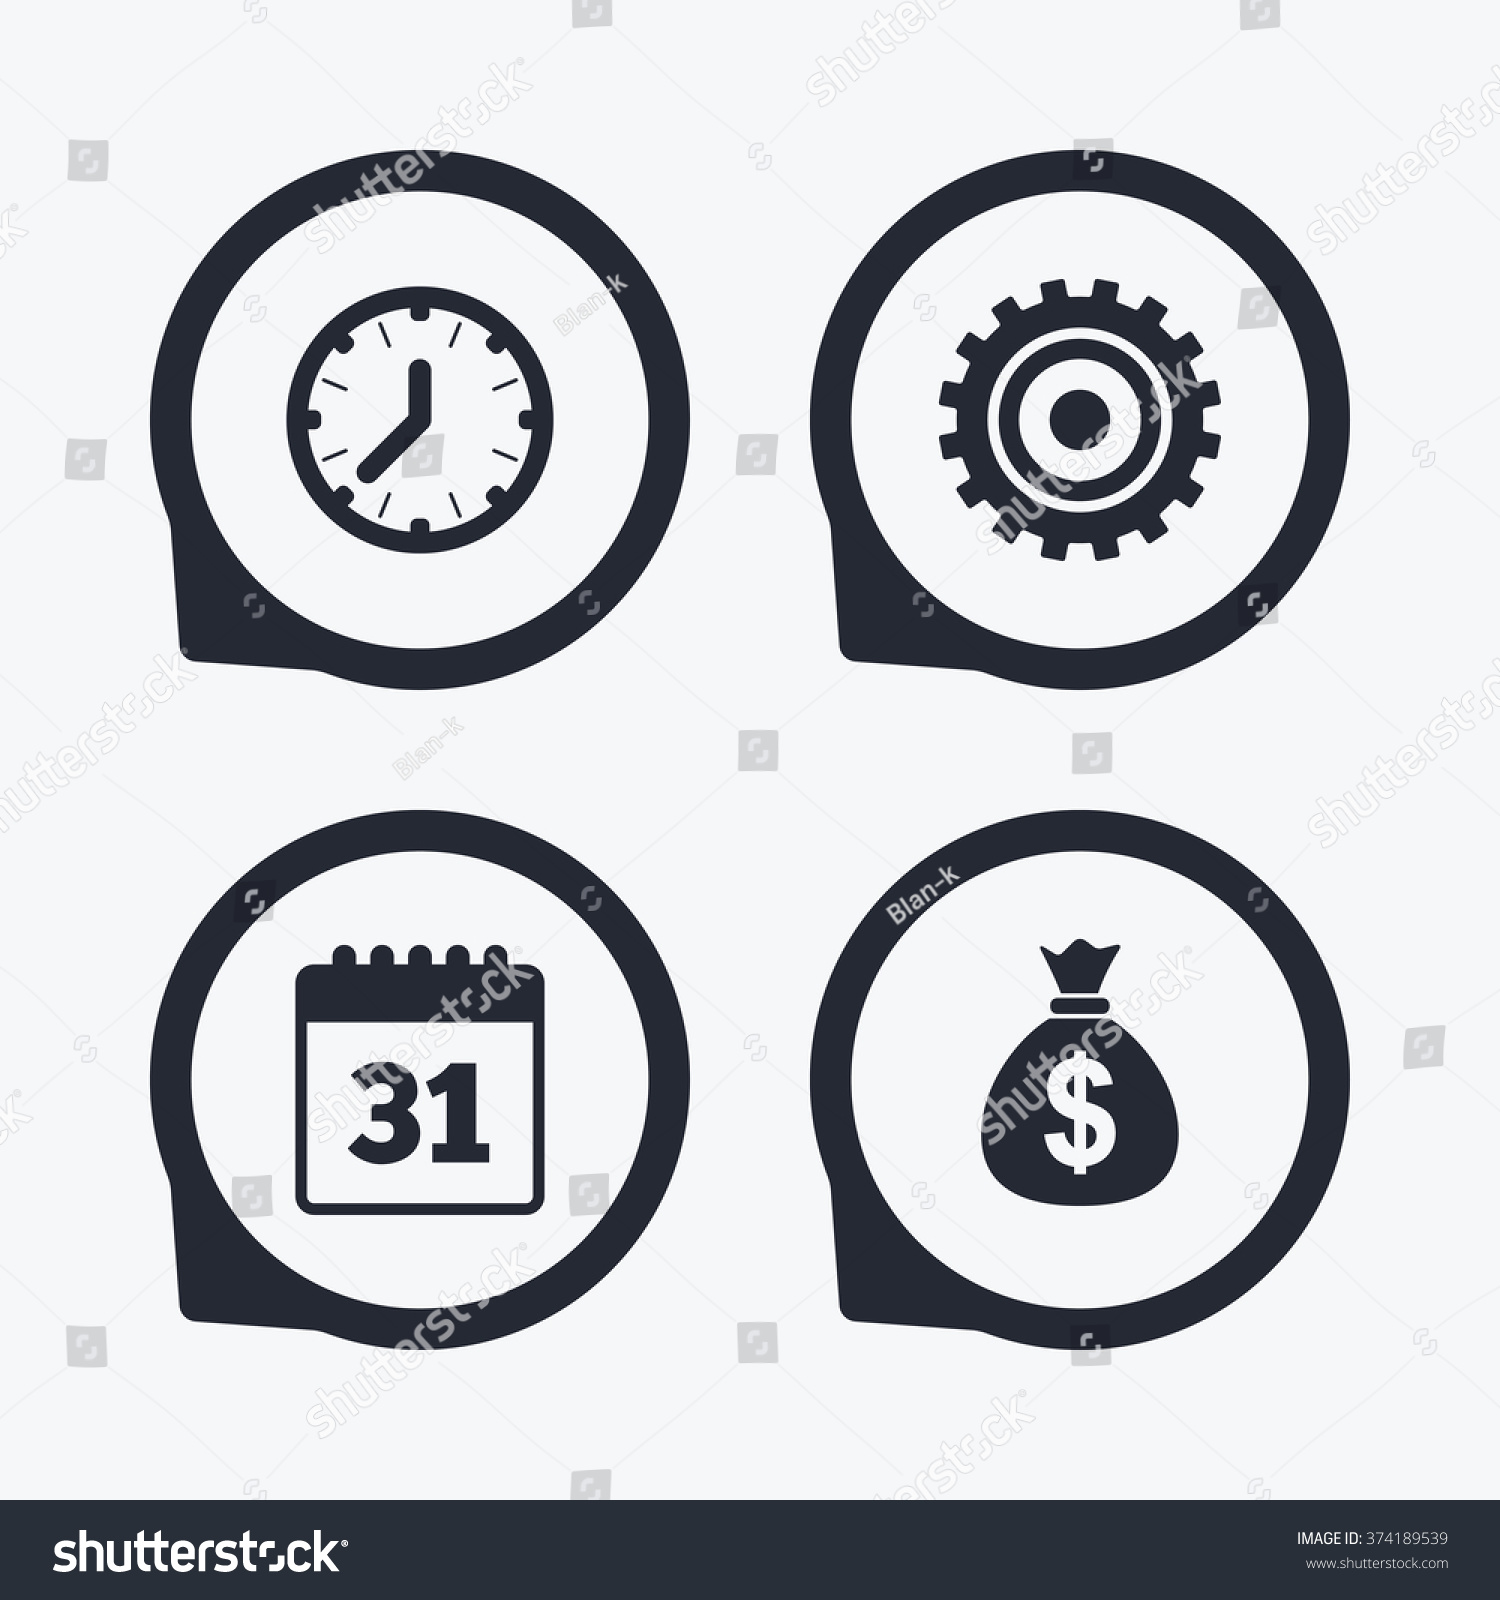 Chinese Mechanical Clock Symbol